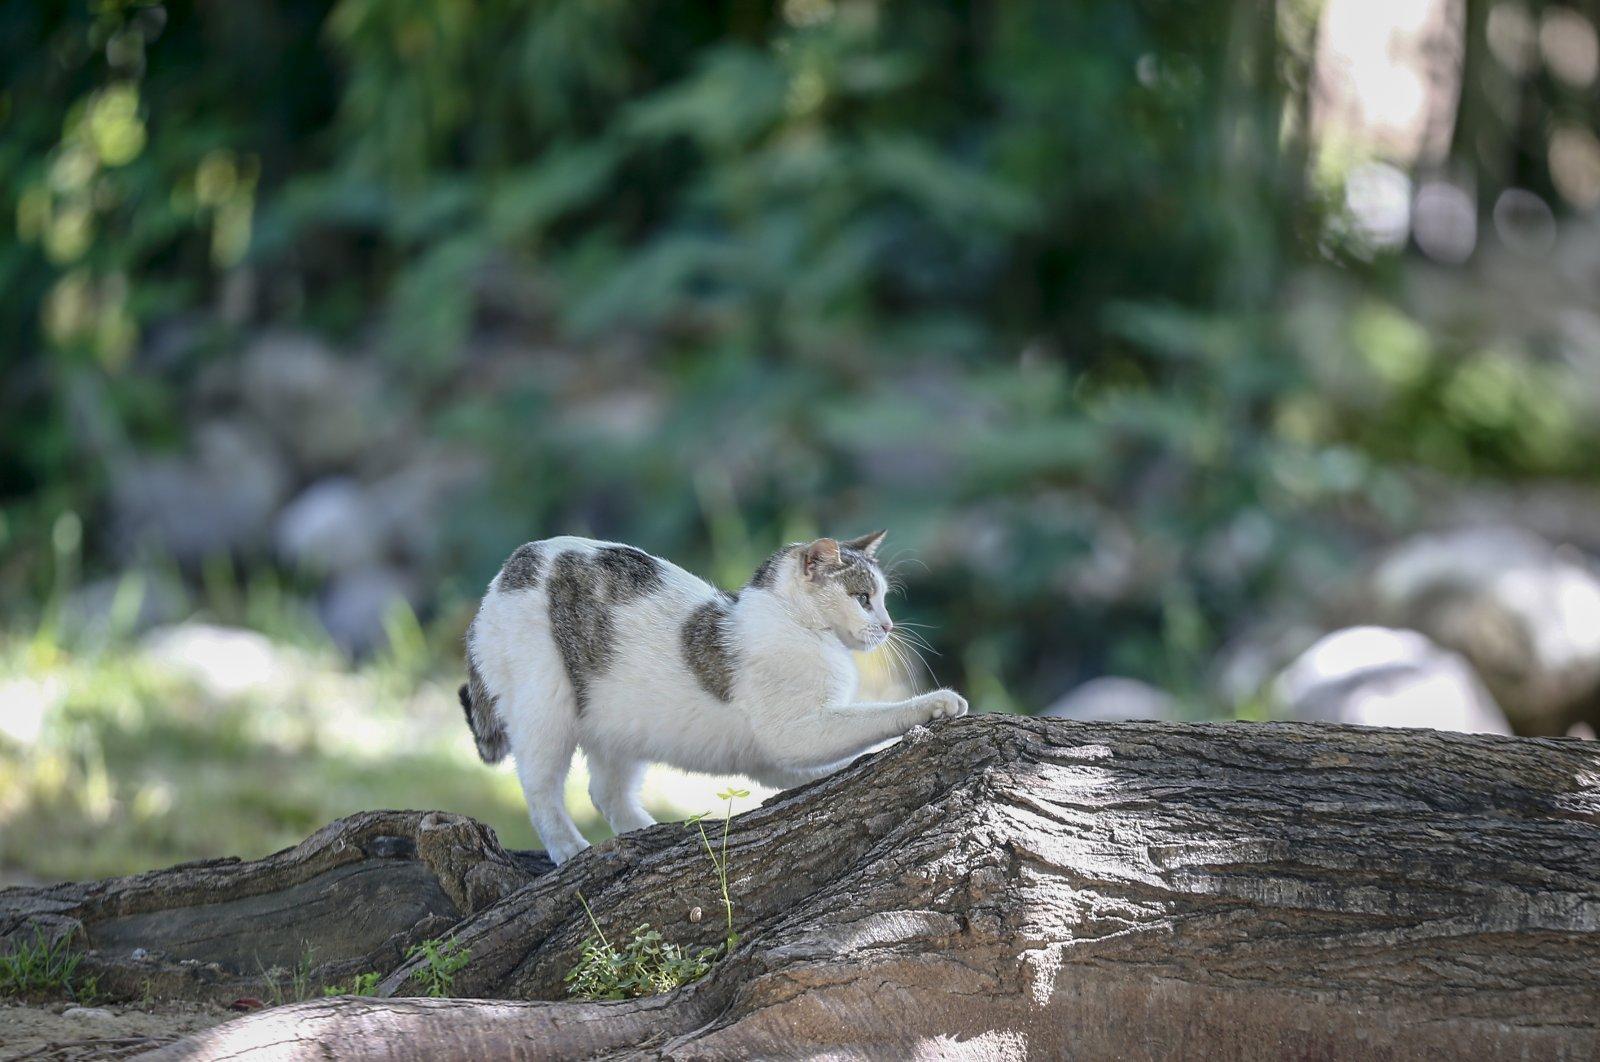 A cat seen in a park in Antalya, Turkey, May 11, 2020. (AA Photo)